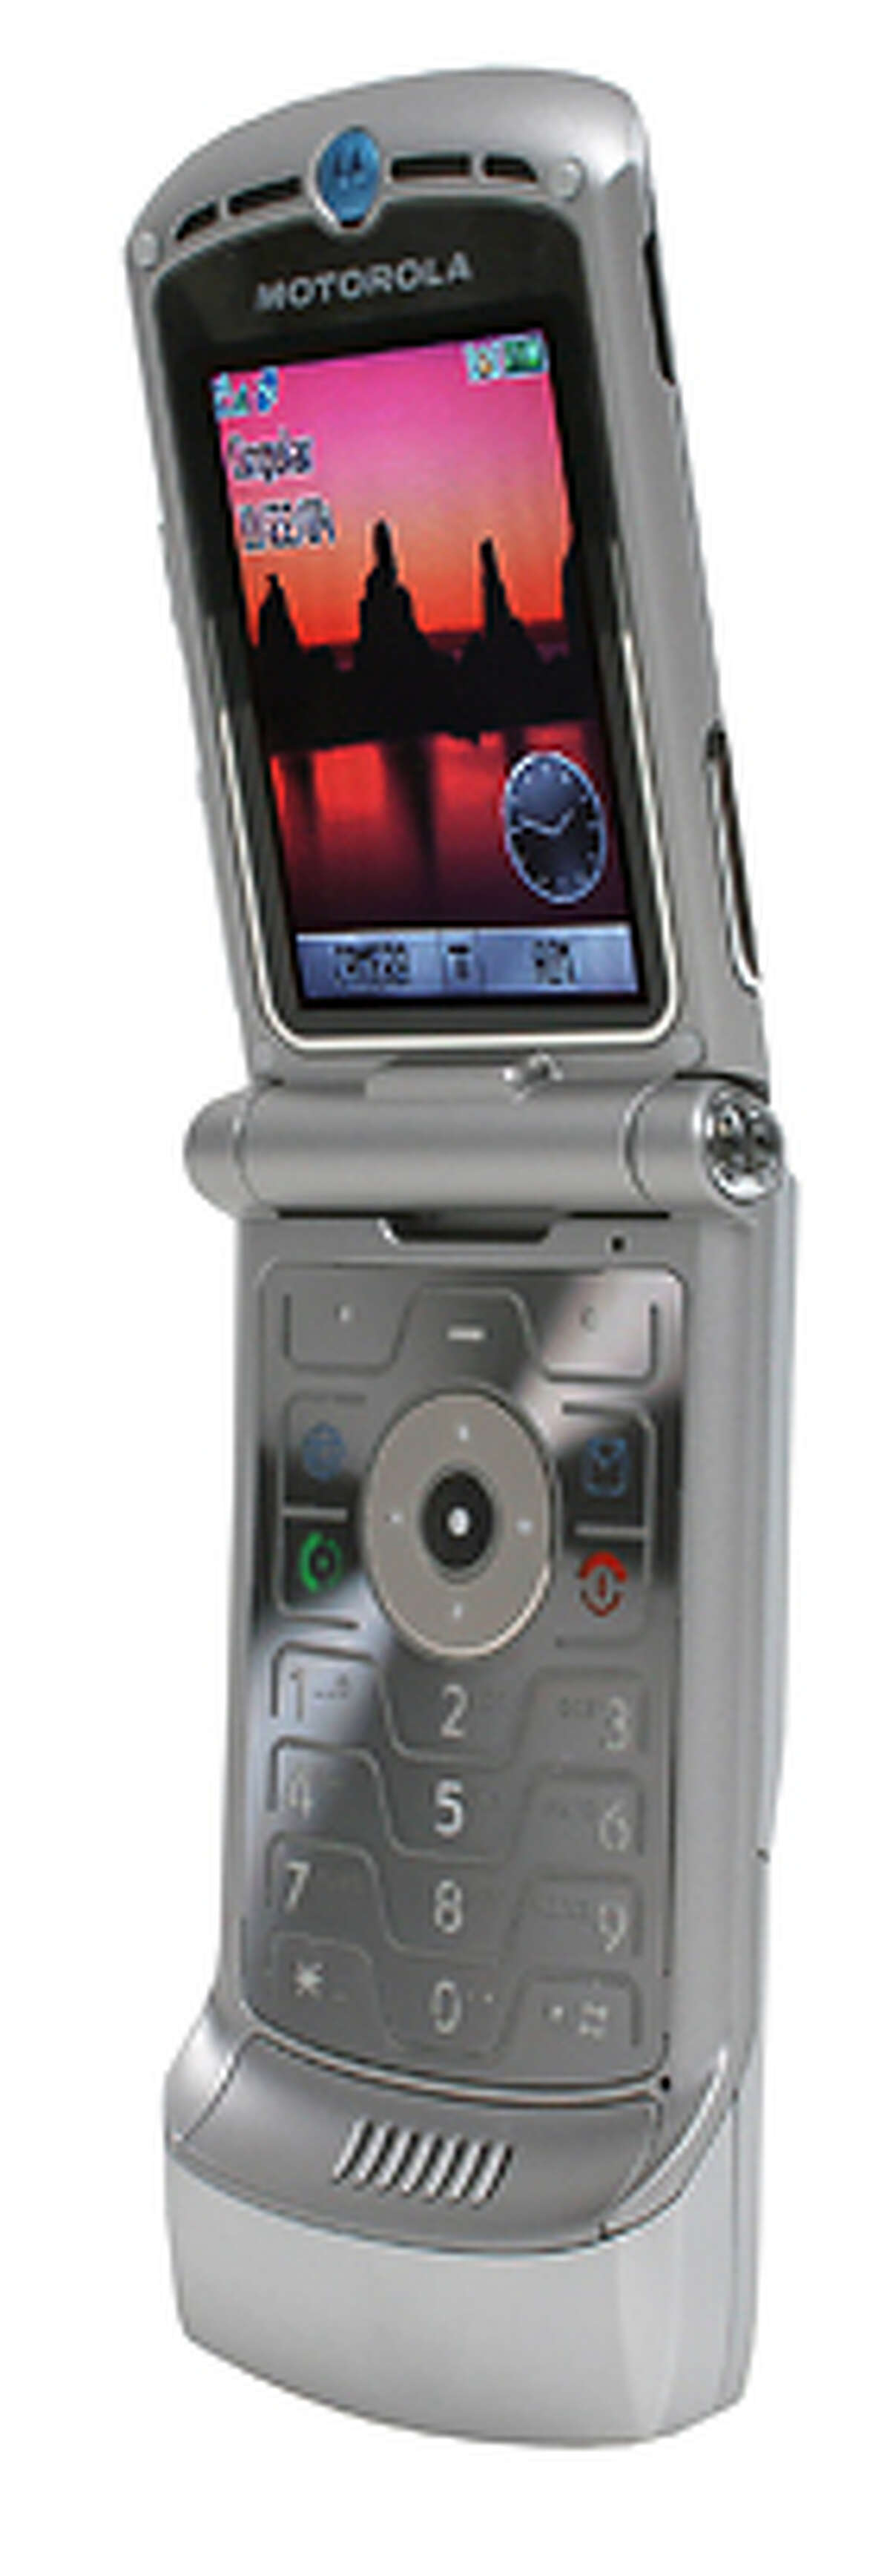 Motorola Razr V3 Credit: CNET images for Chronicle gift guide